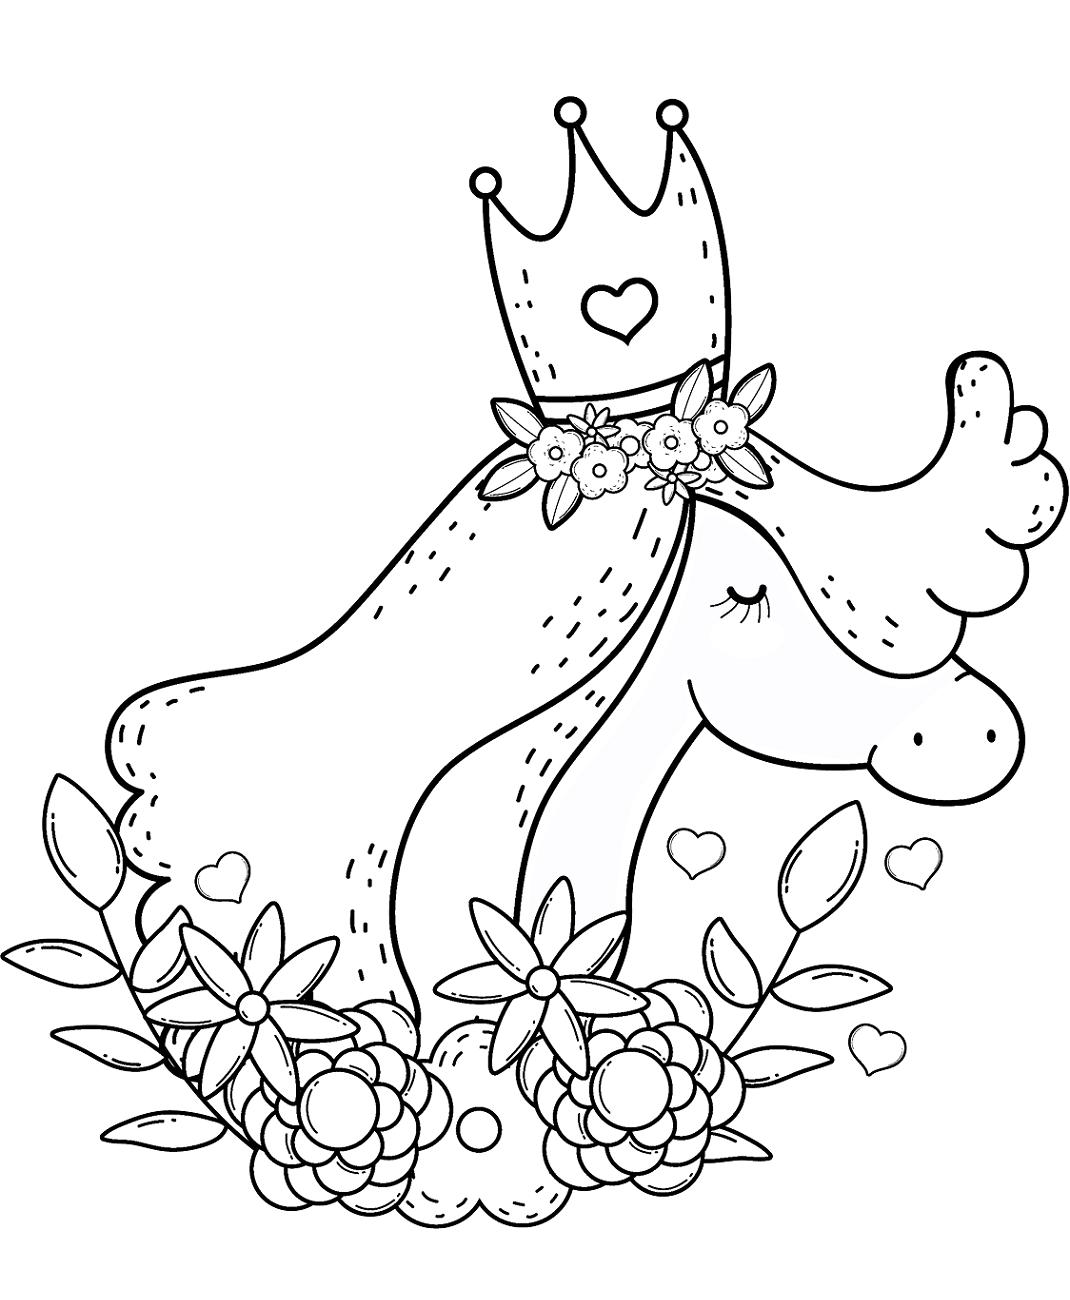 Unicorn Wearing Crown Coloring Page - Free Printable ...